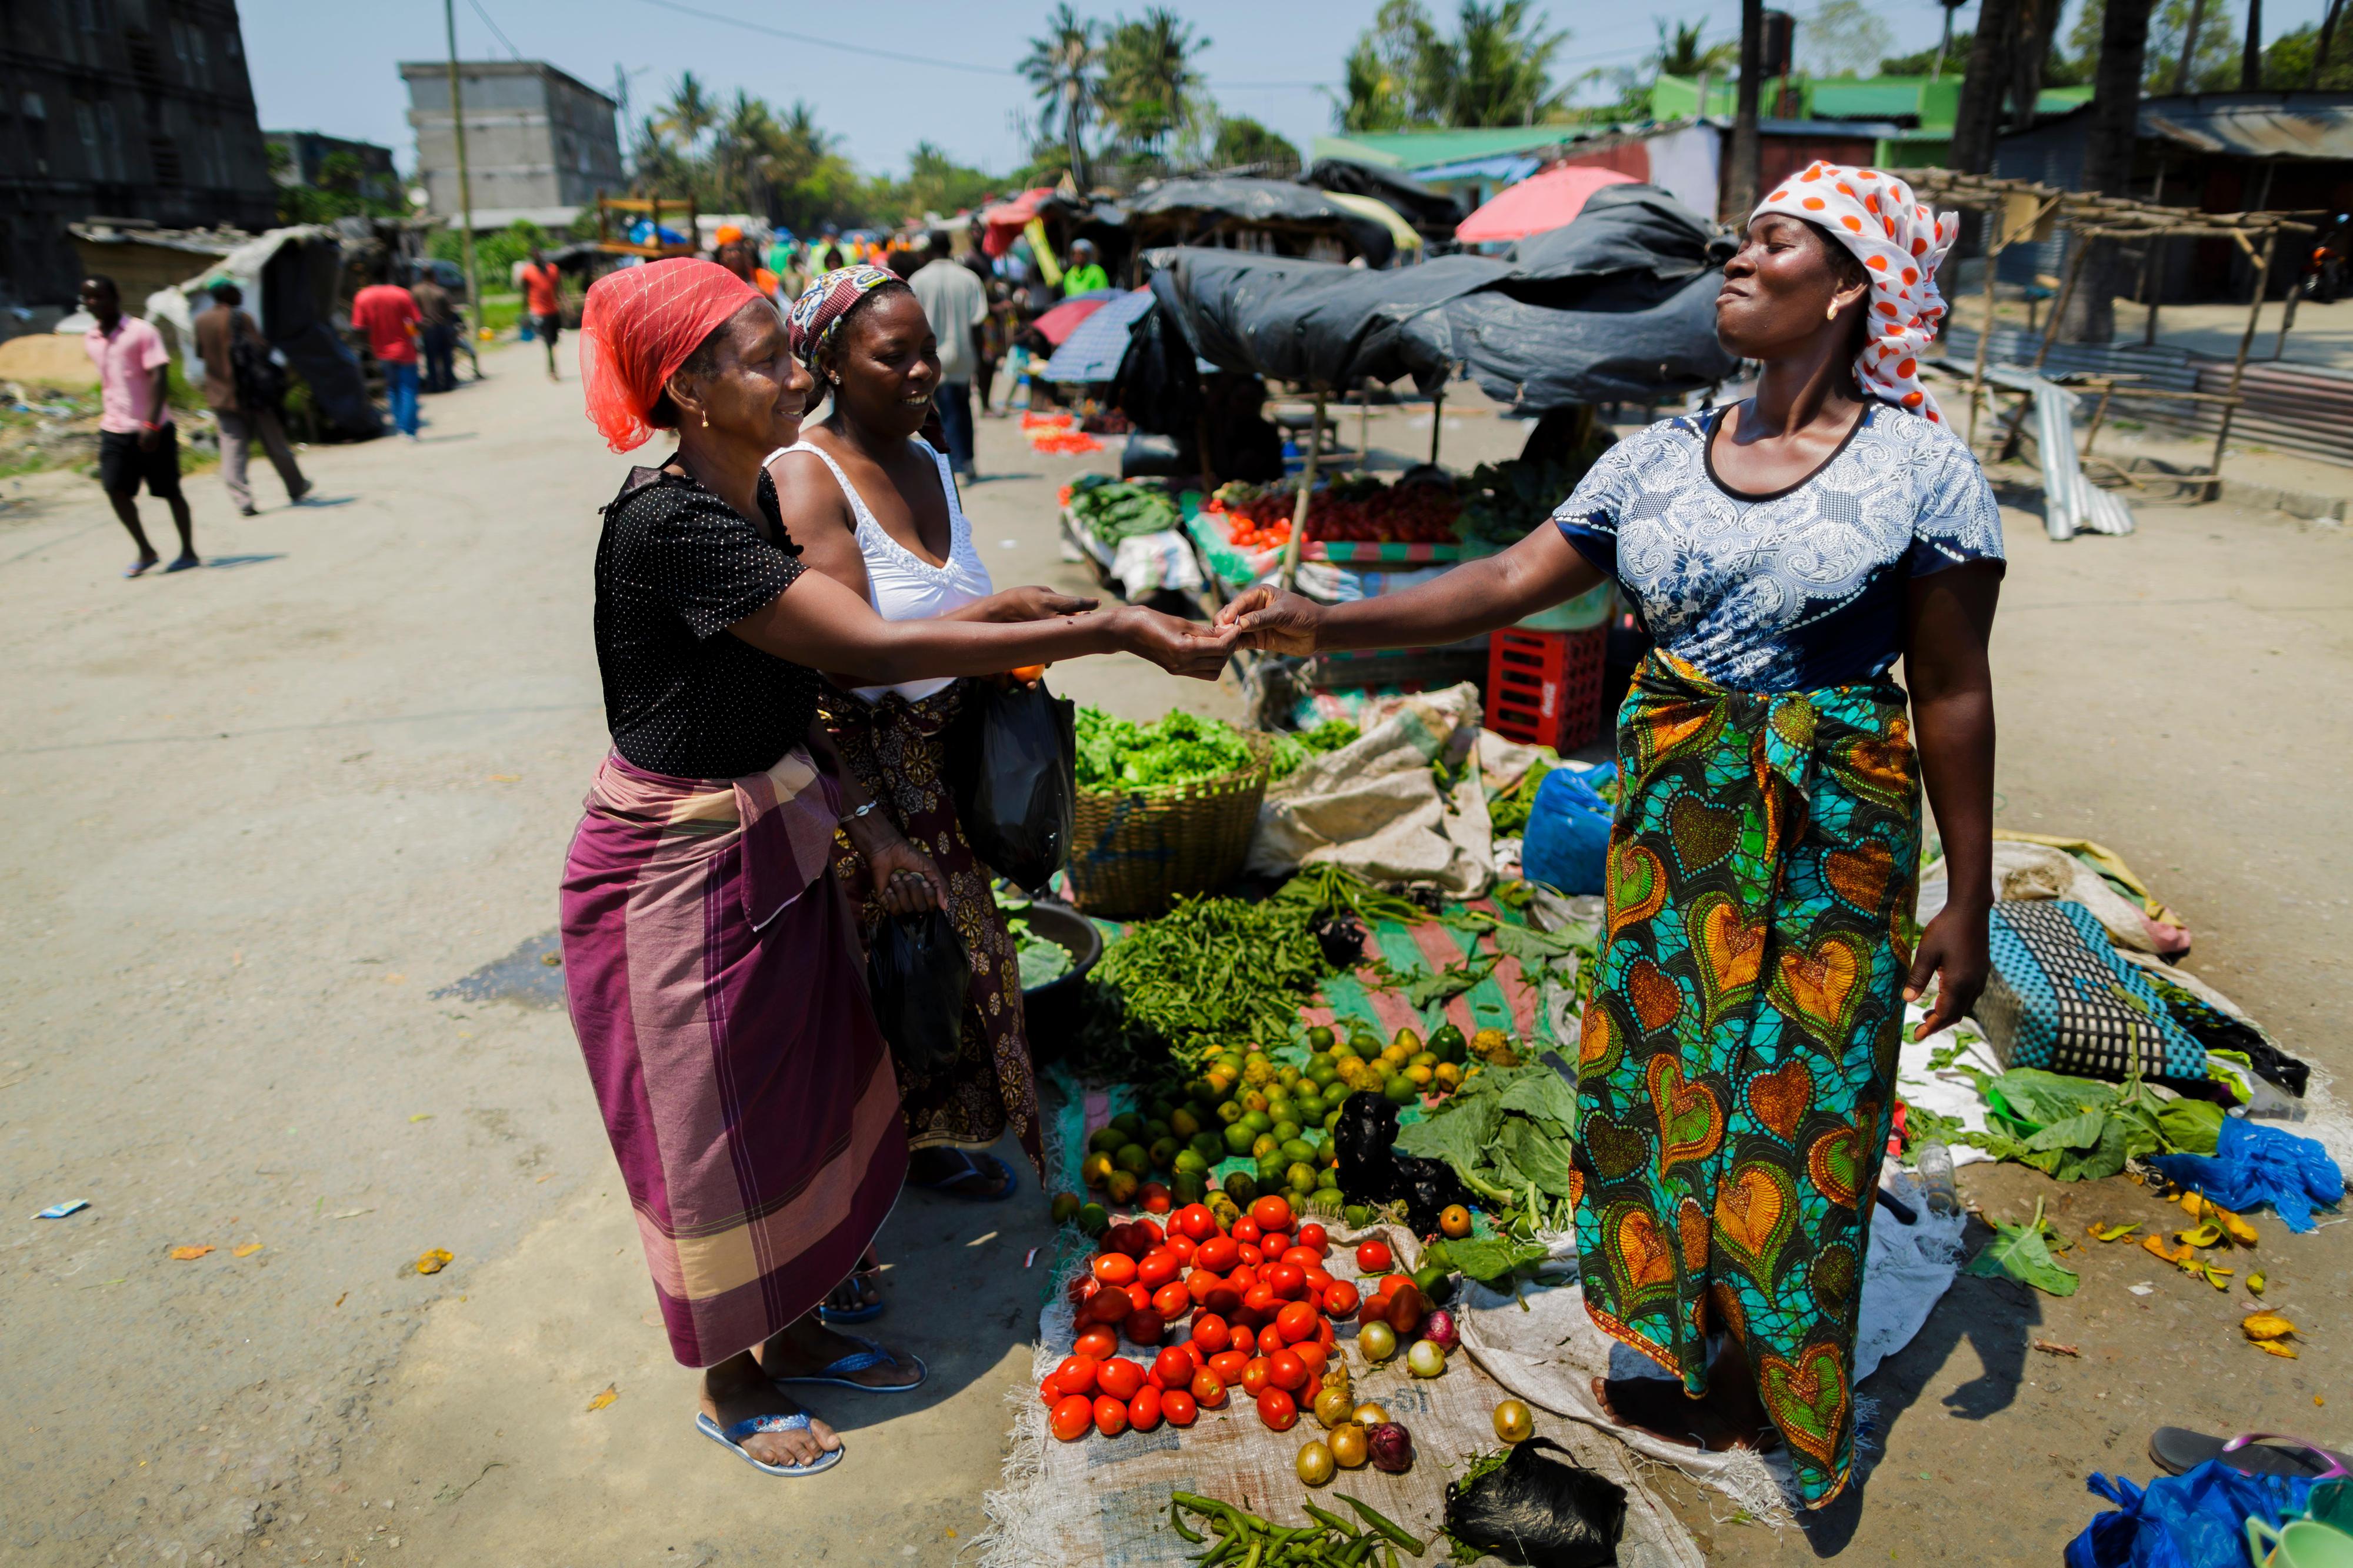 Marktszene in Mosambik